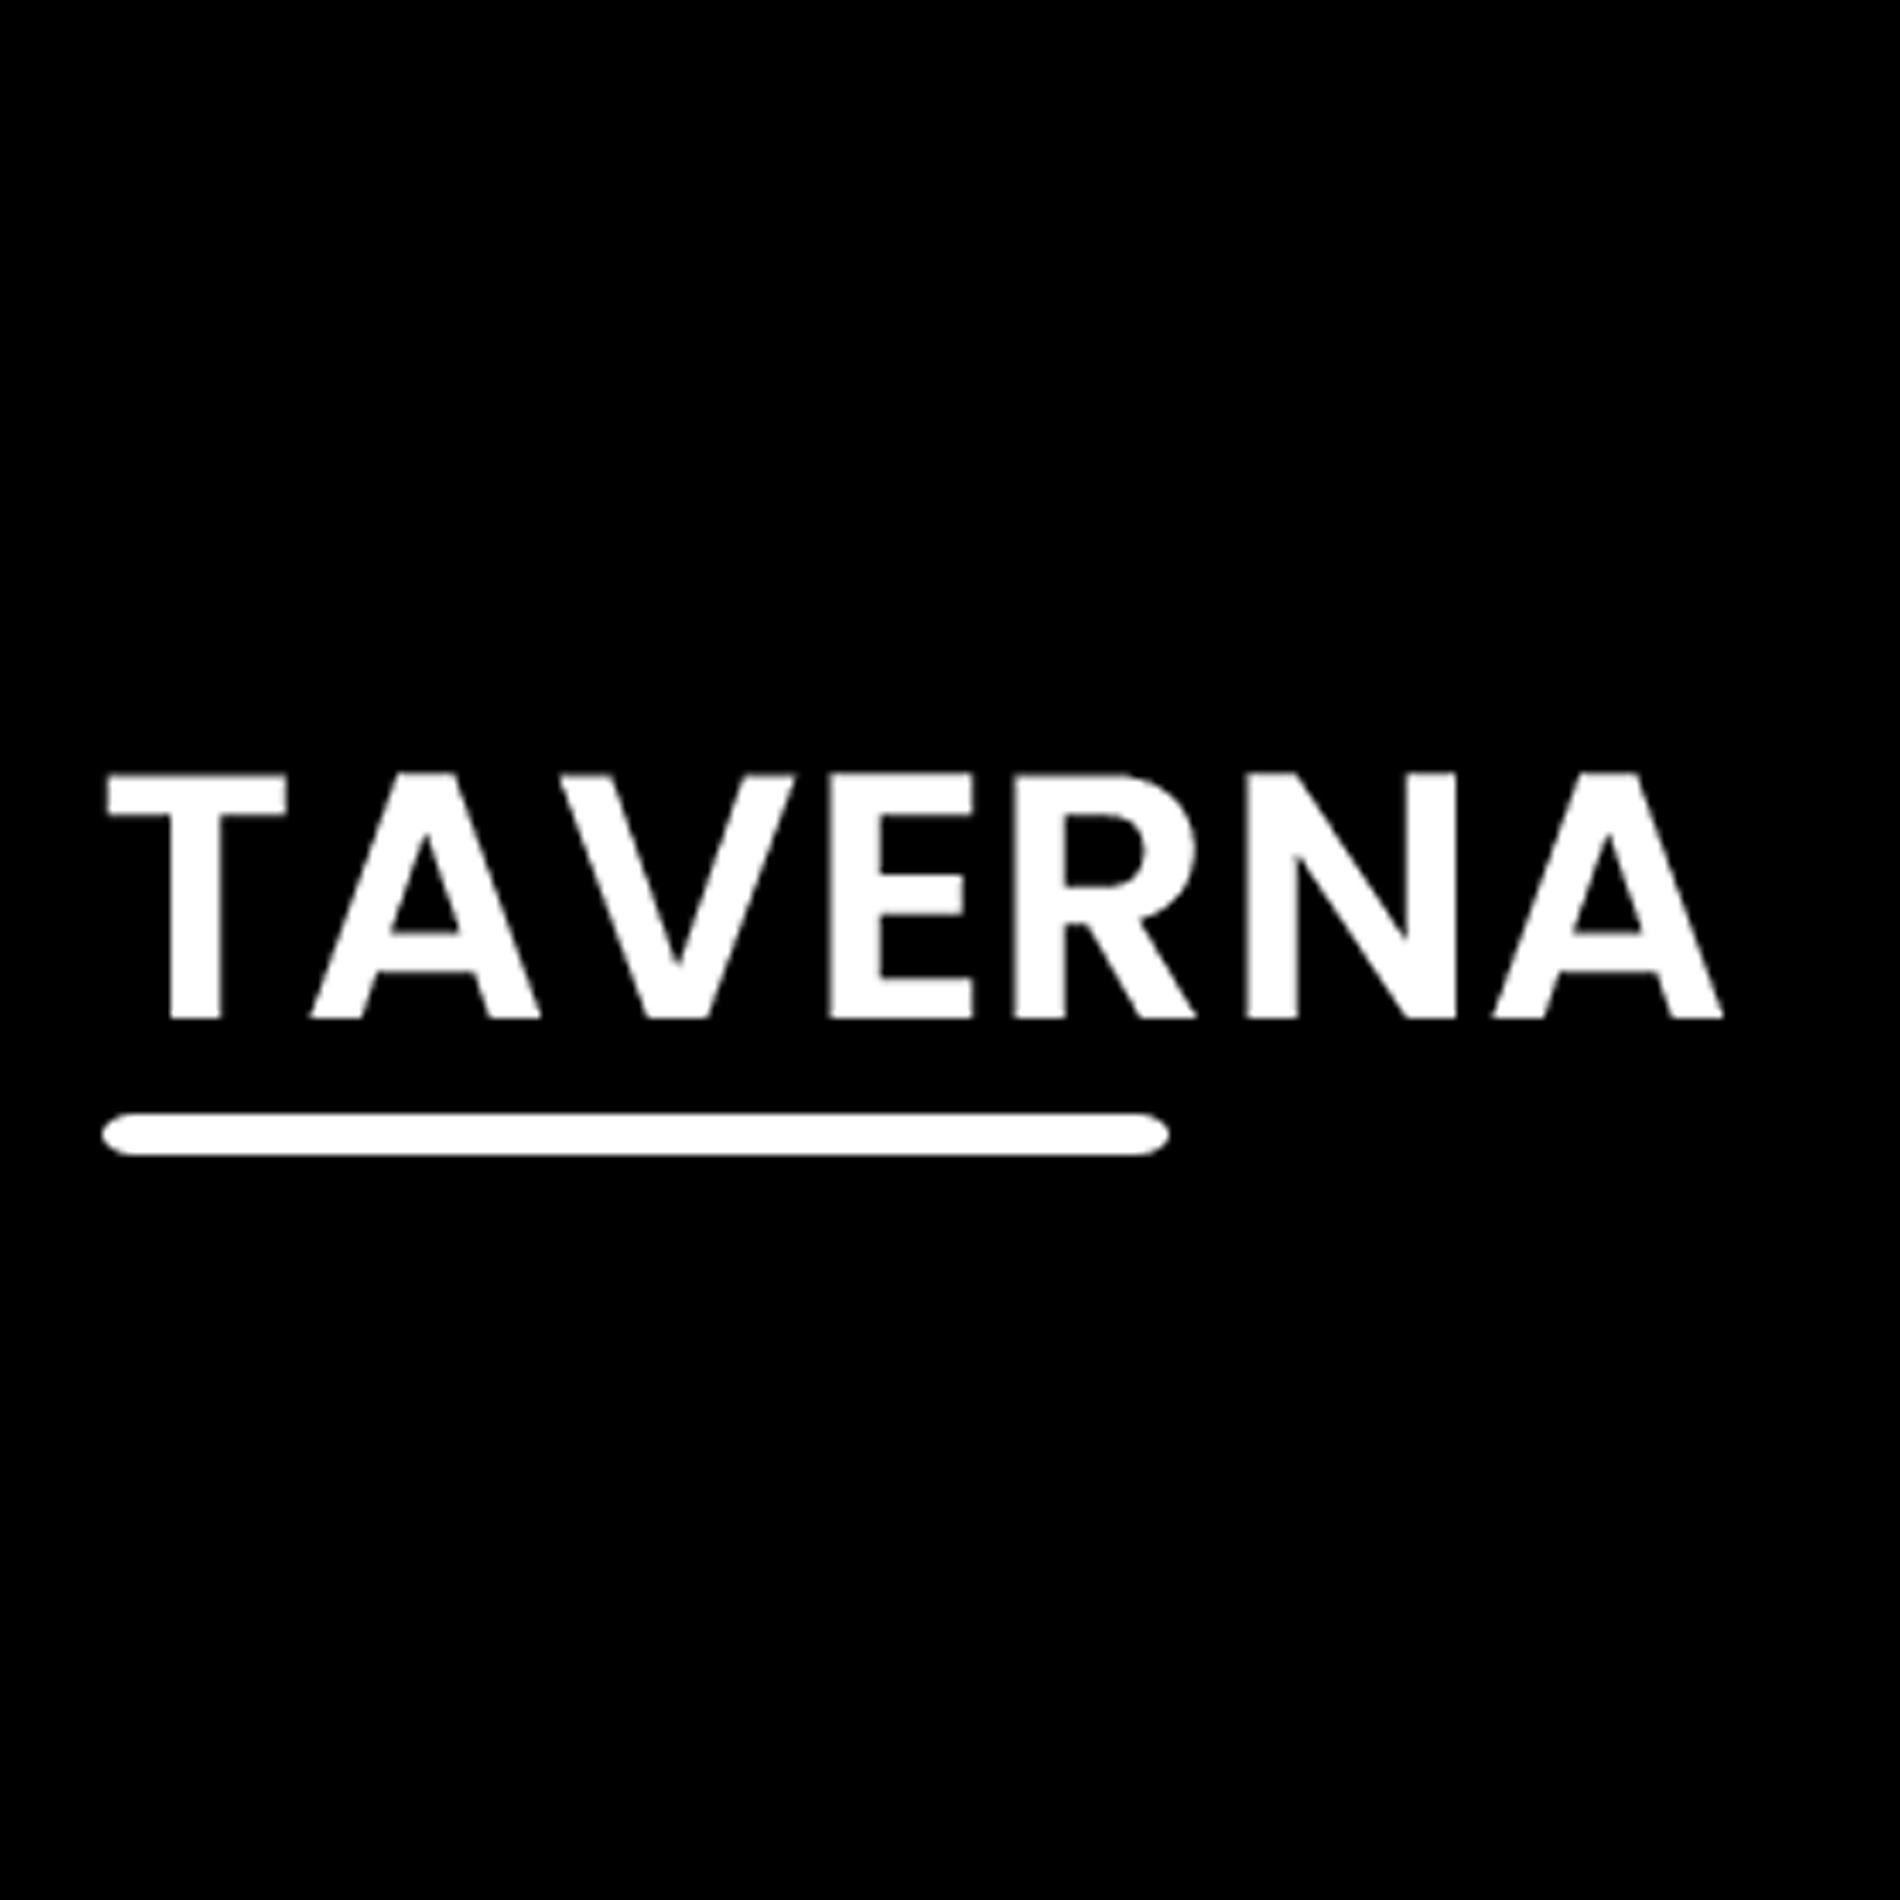 Ristorante Pizzeria Taverna Italiana